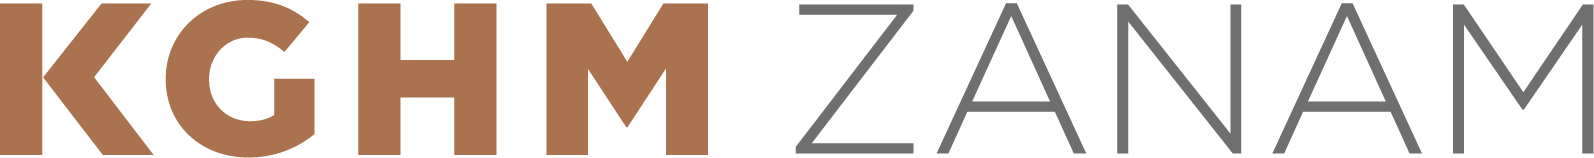 logo spółki kghm zanam